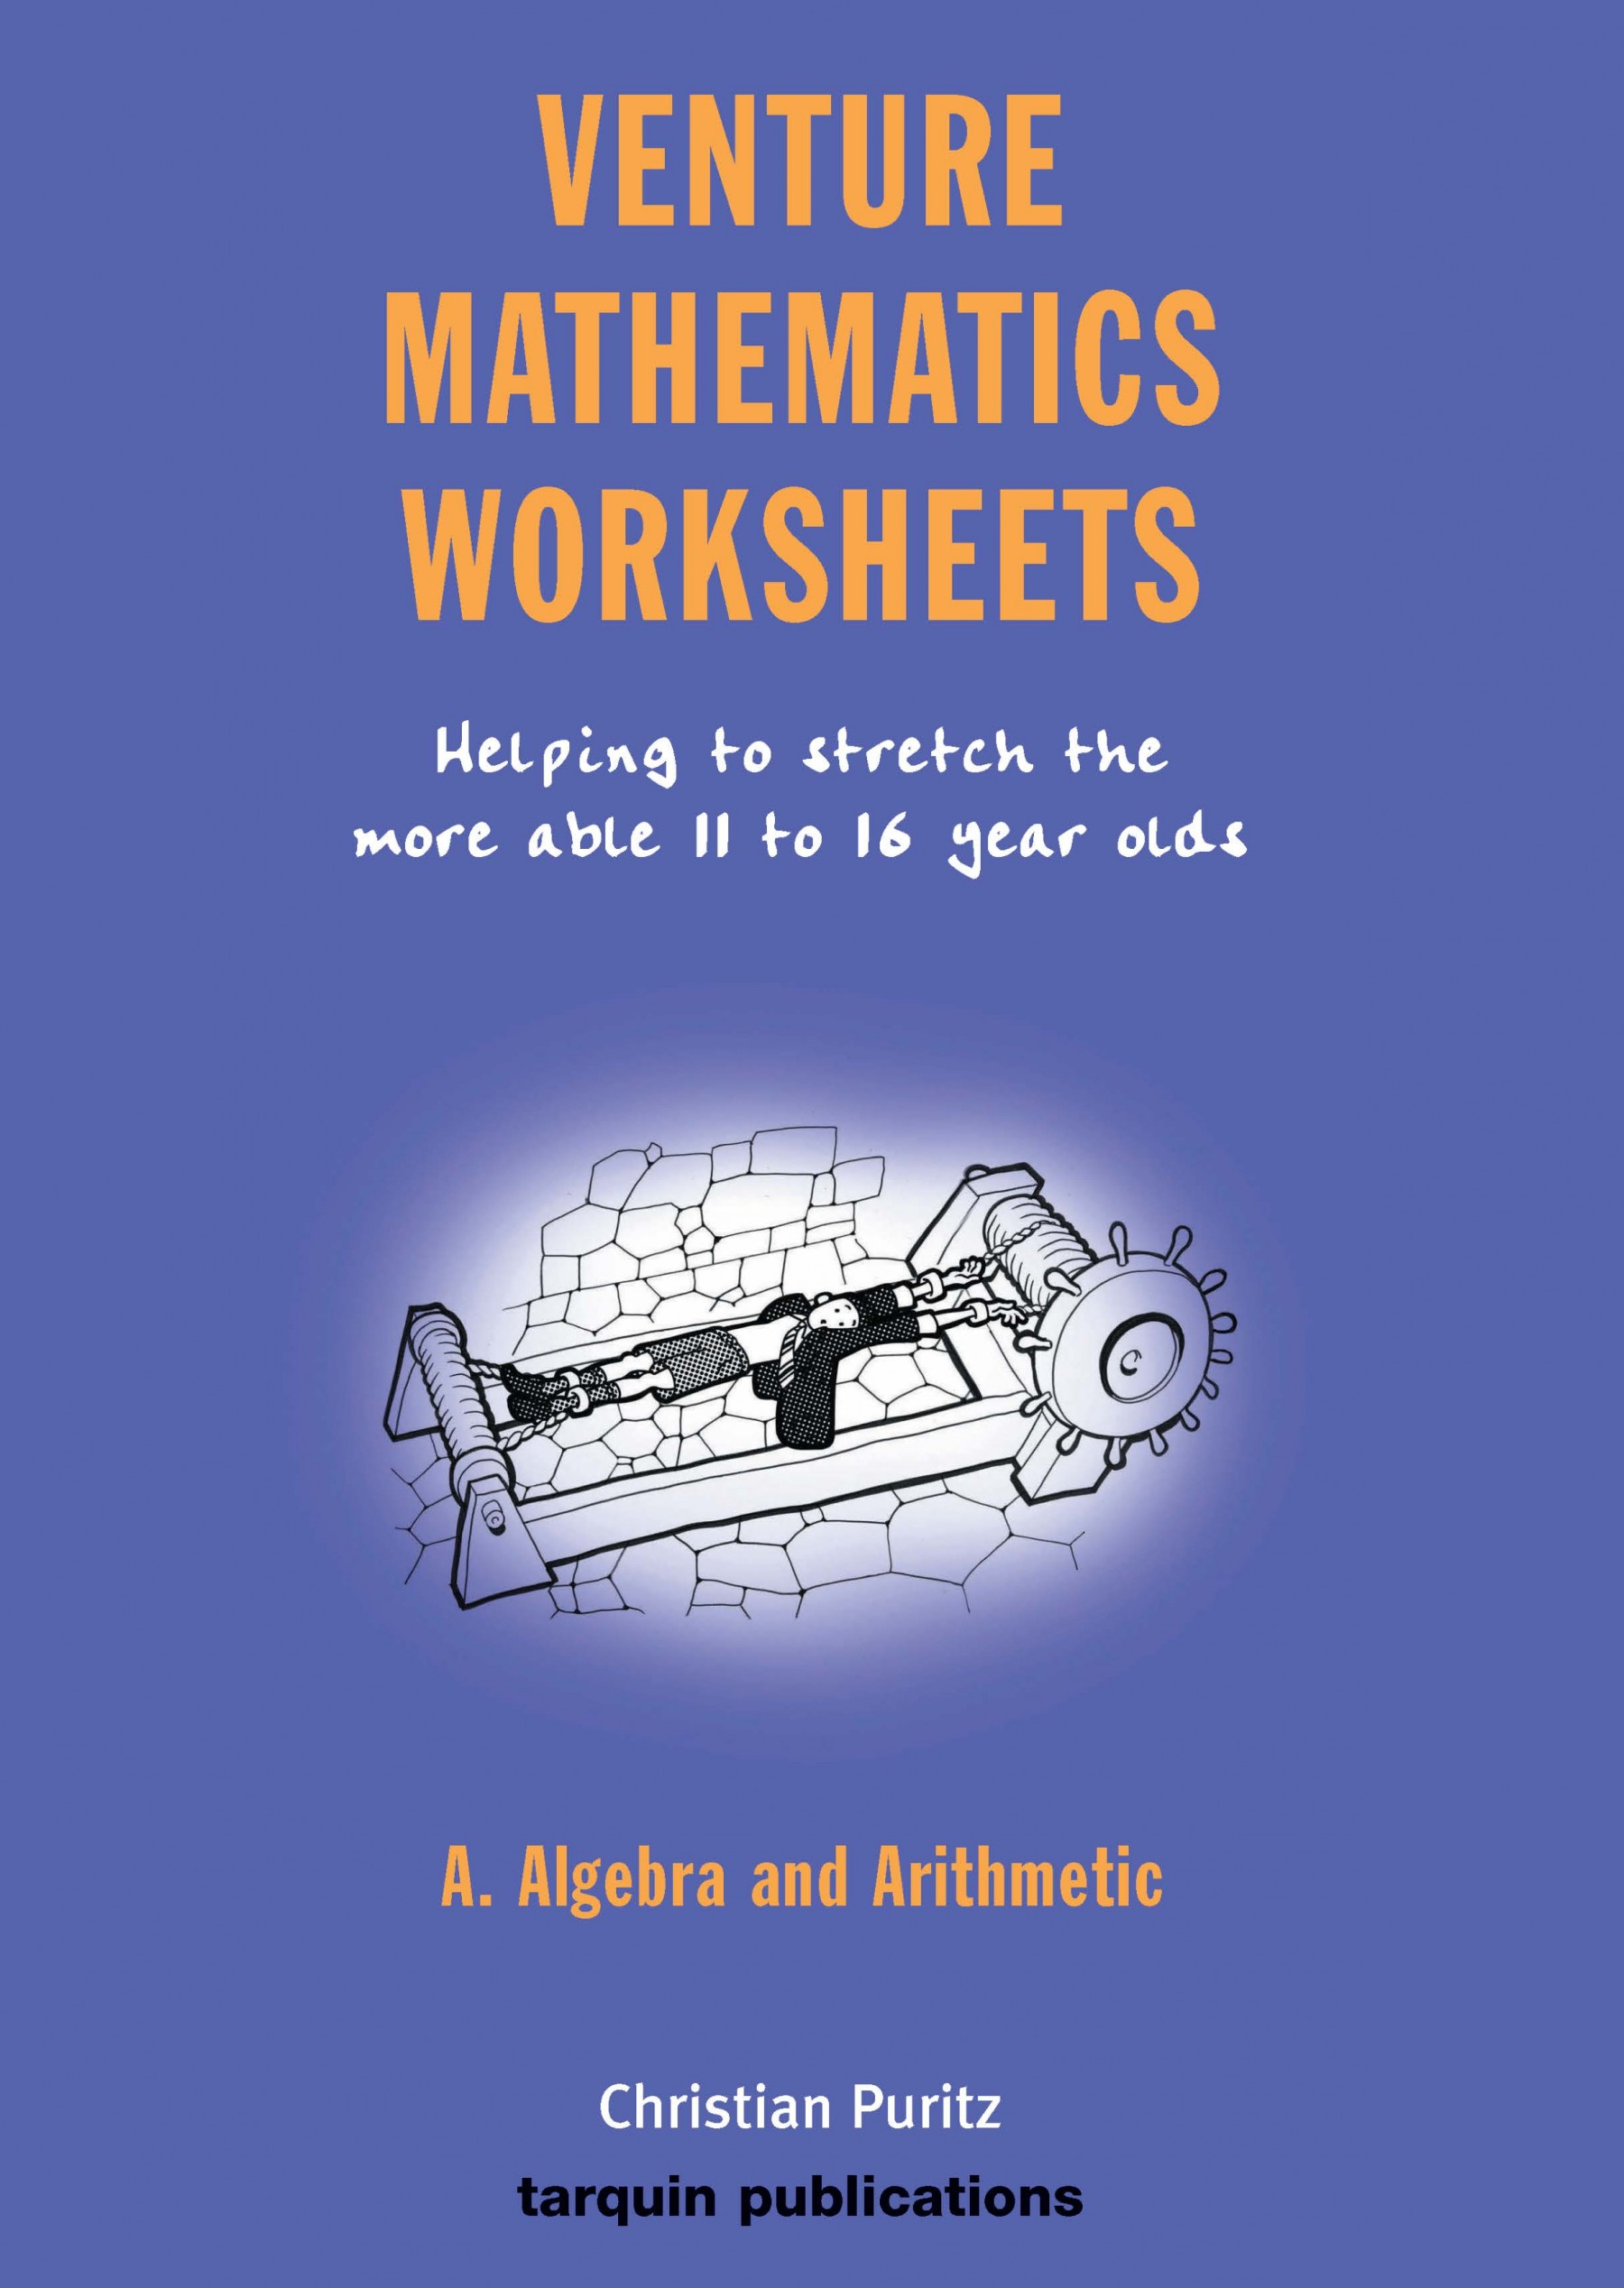 Venture Mathematics Worksheets